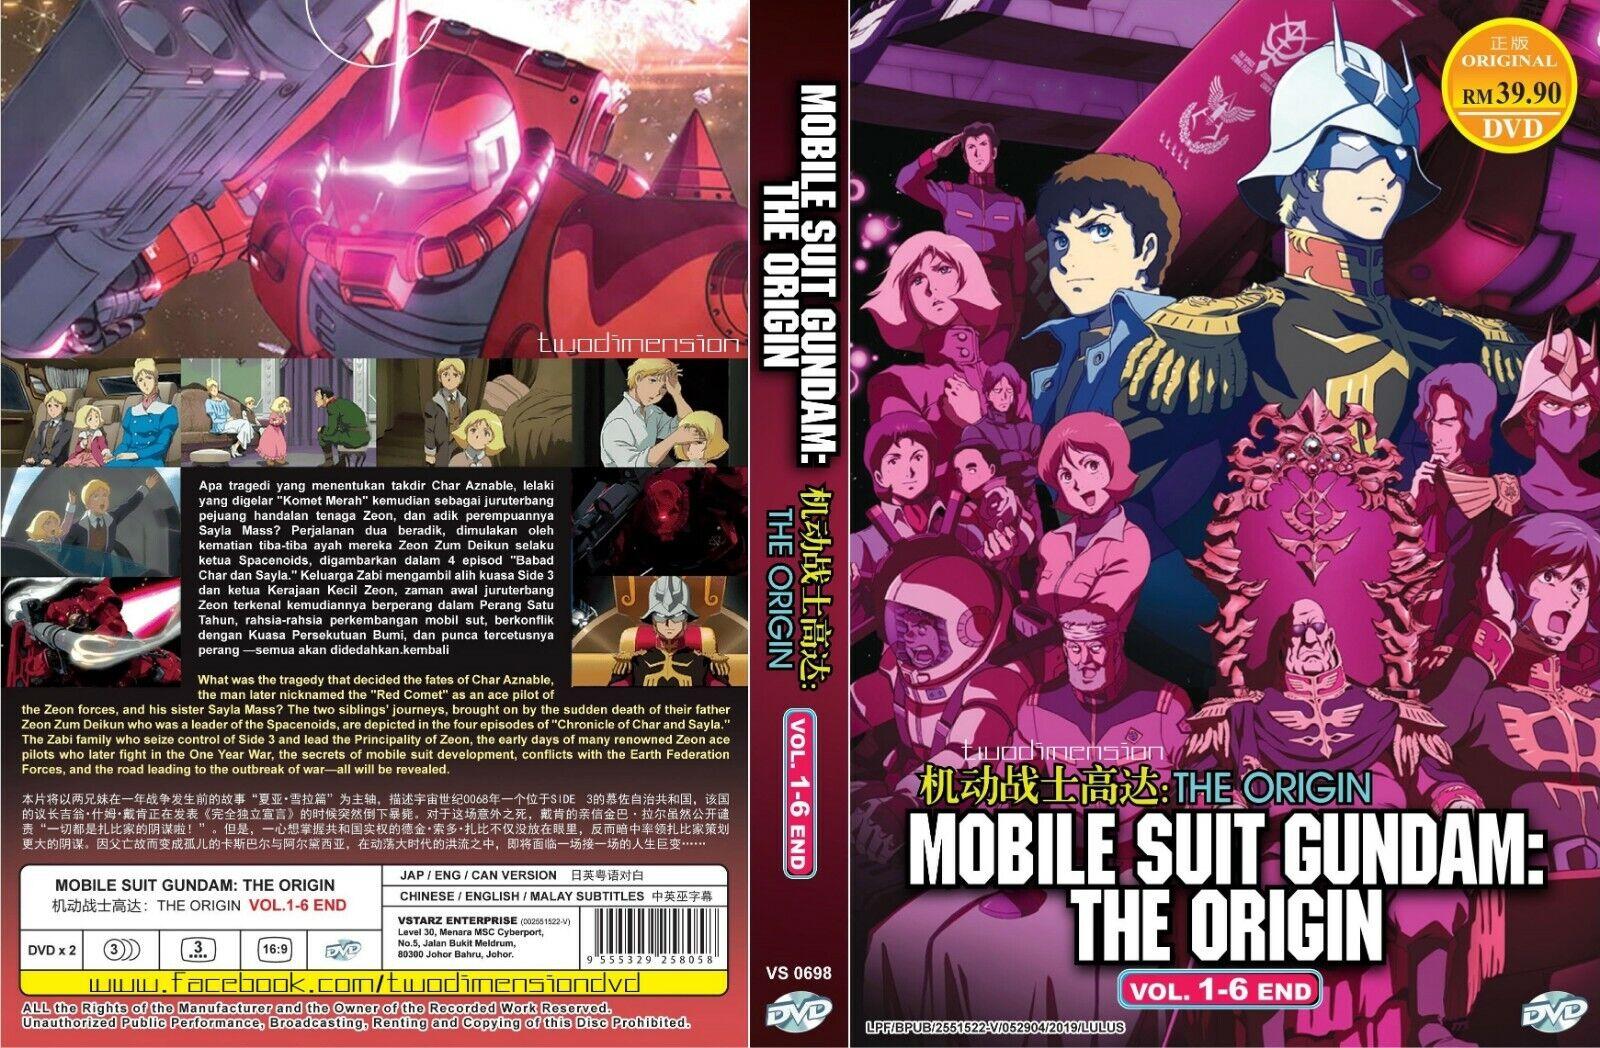 Anime Dvd When They Cry Higurashi No Naku Koro Ni 1 26 End English Dub Free Ship For Sale Online Ebay